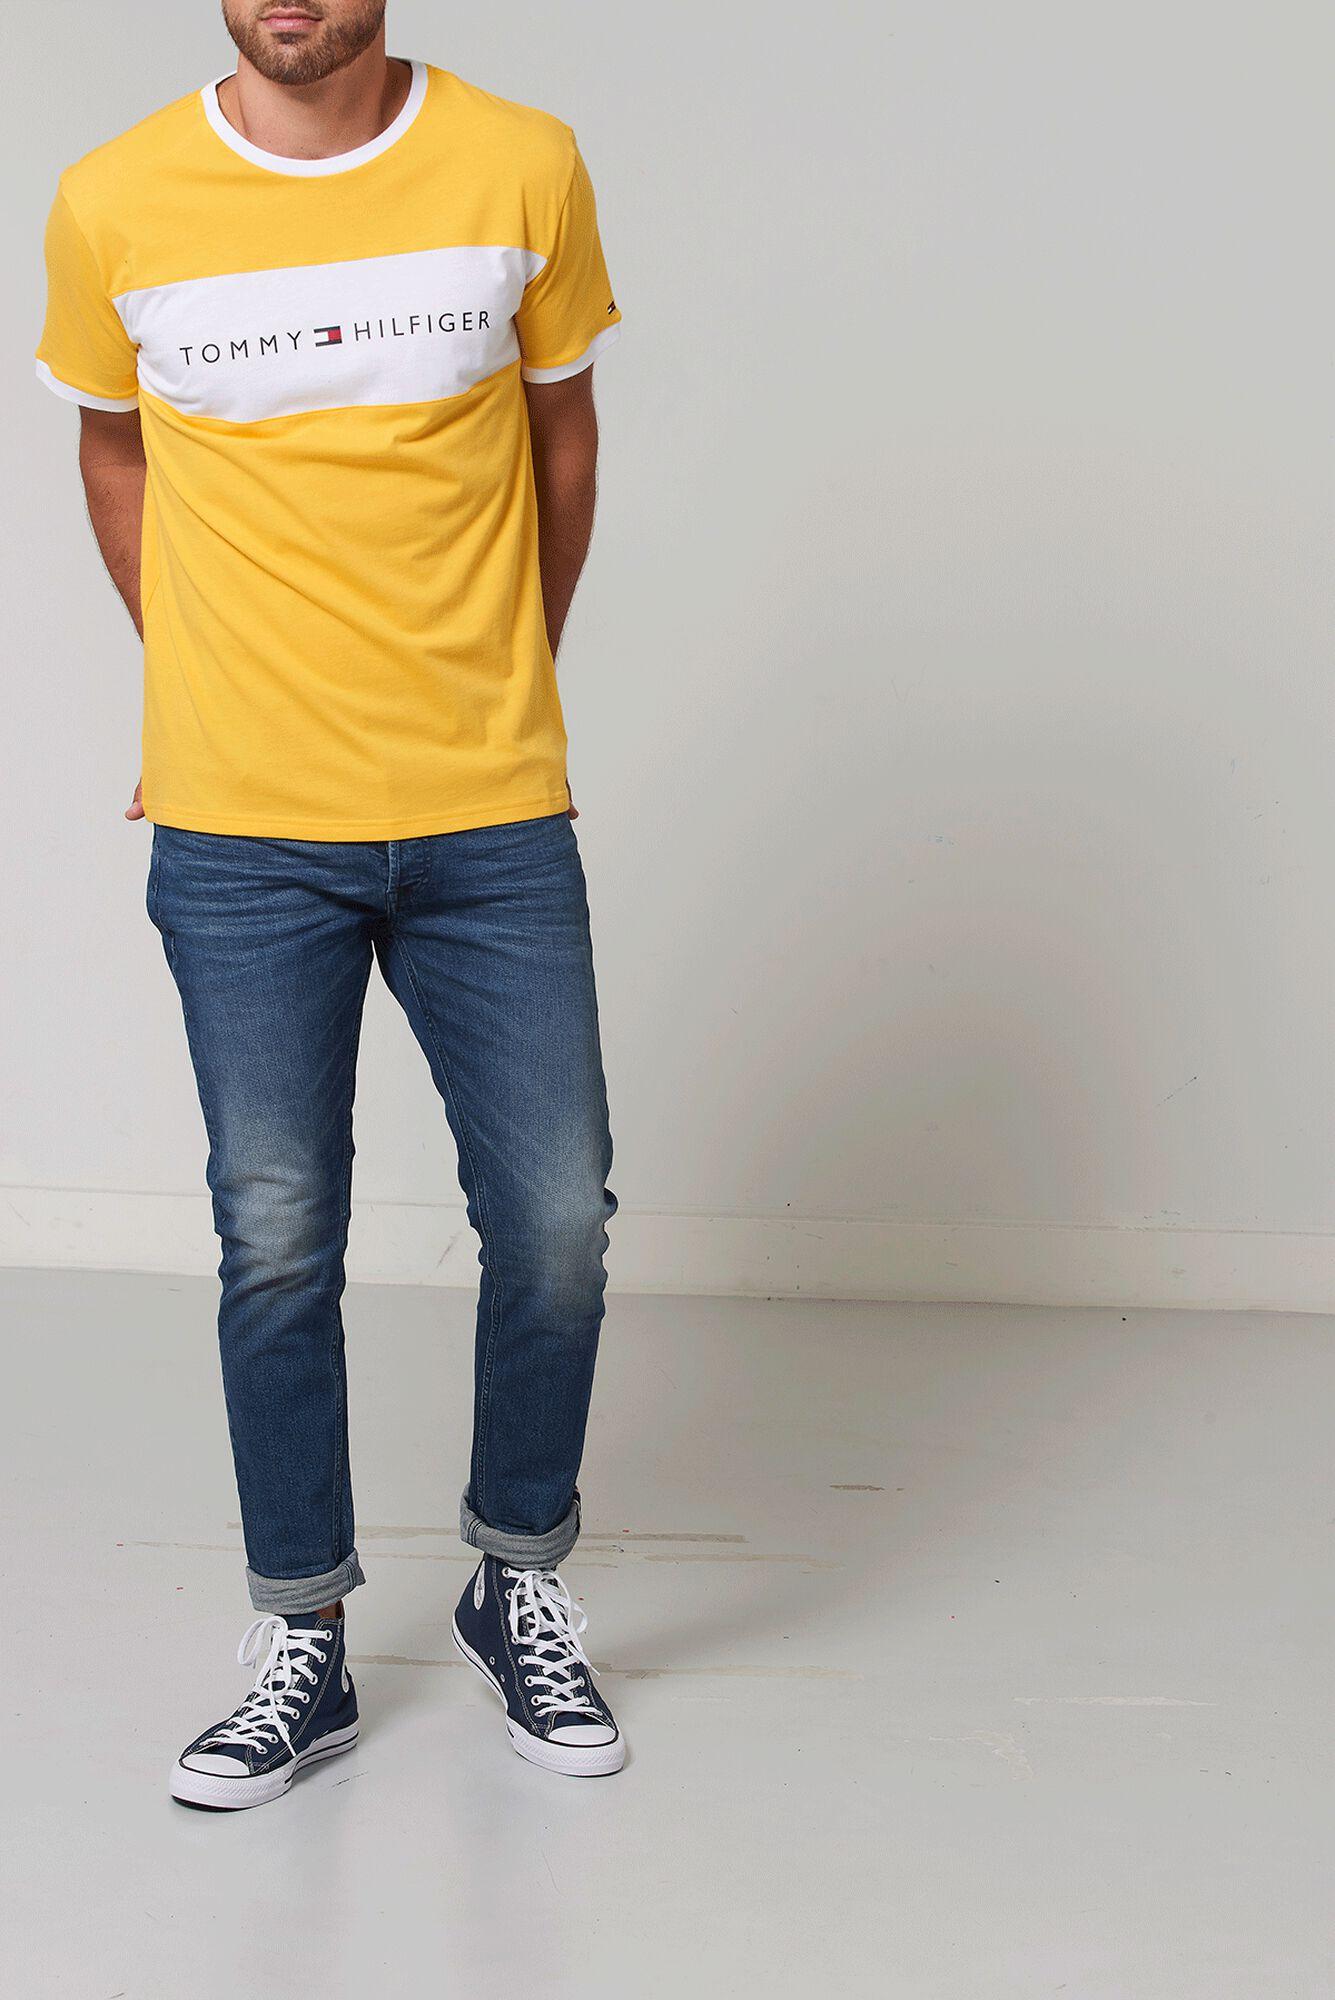 c359ff81 Men T-shirt Tommy Hilfiger Logo Yellow Buy Online